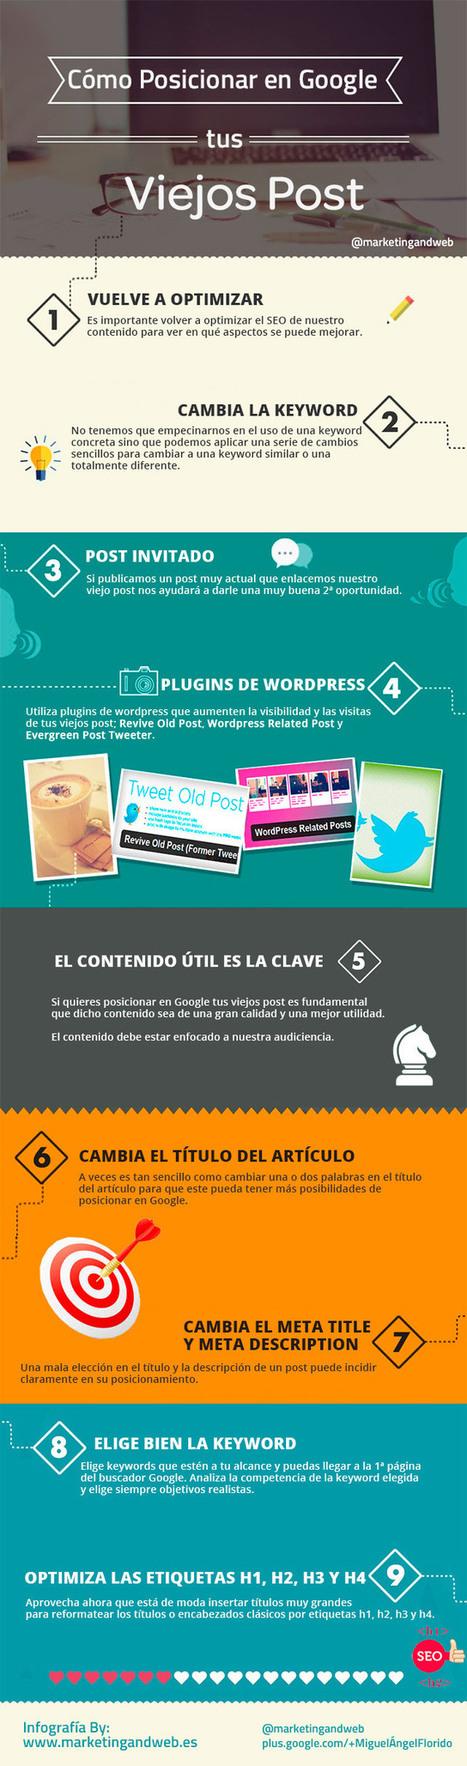 Cómo posicionar en Google tus viejos posts #infografia #infographic #seo #socialmedia | Seo, Social Media Marketing | Scoop.it